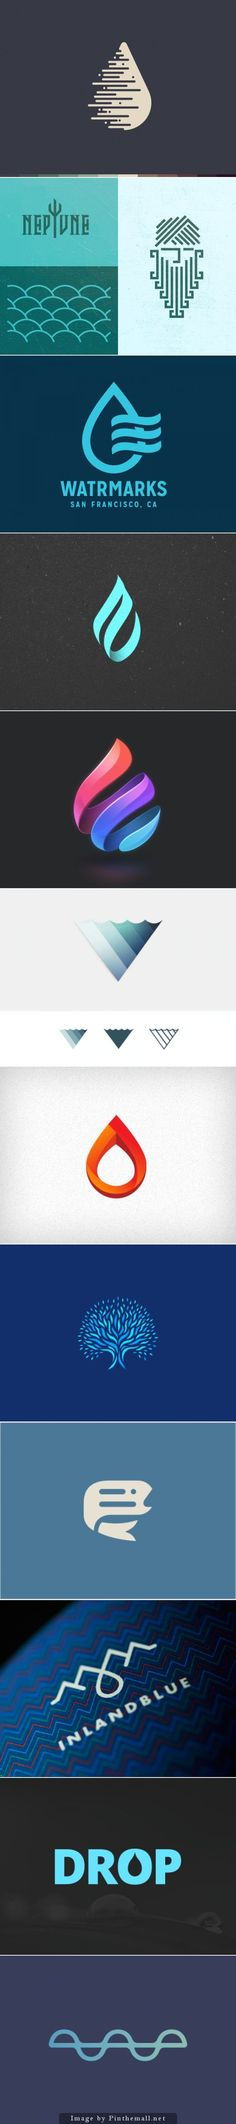 #logo: